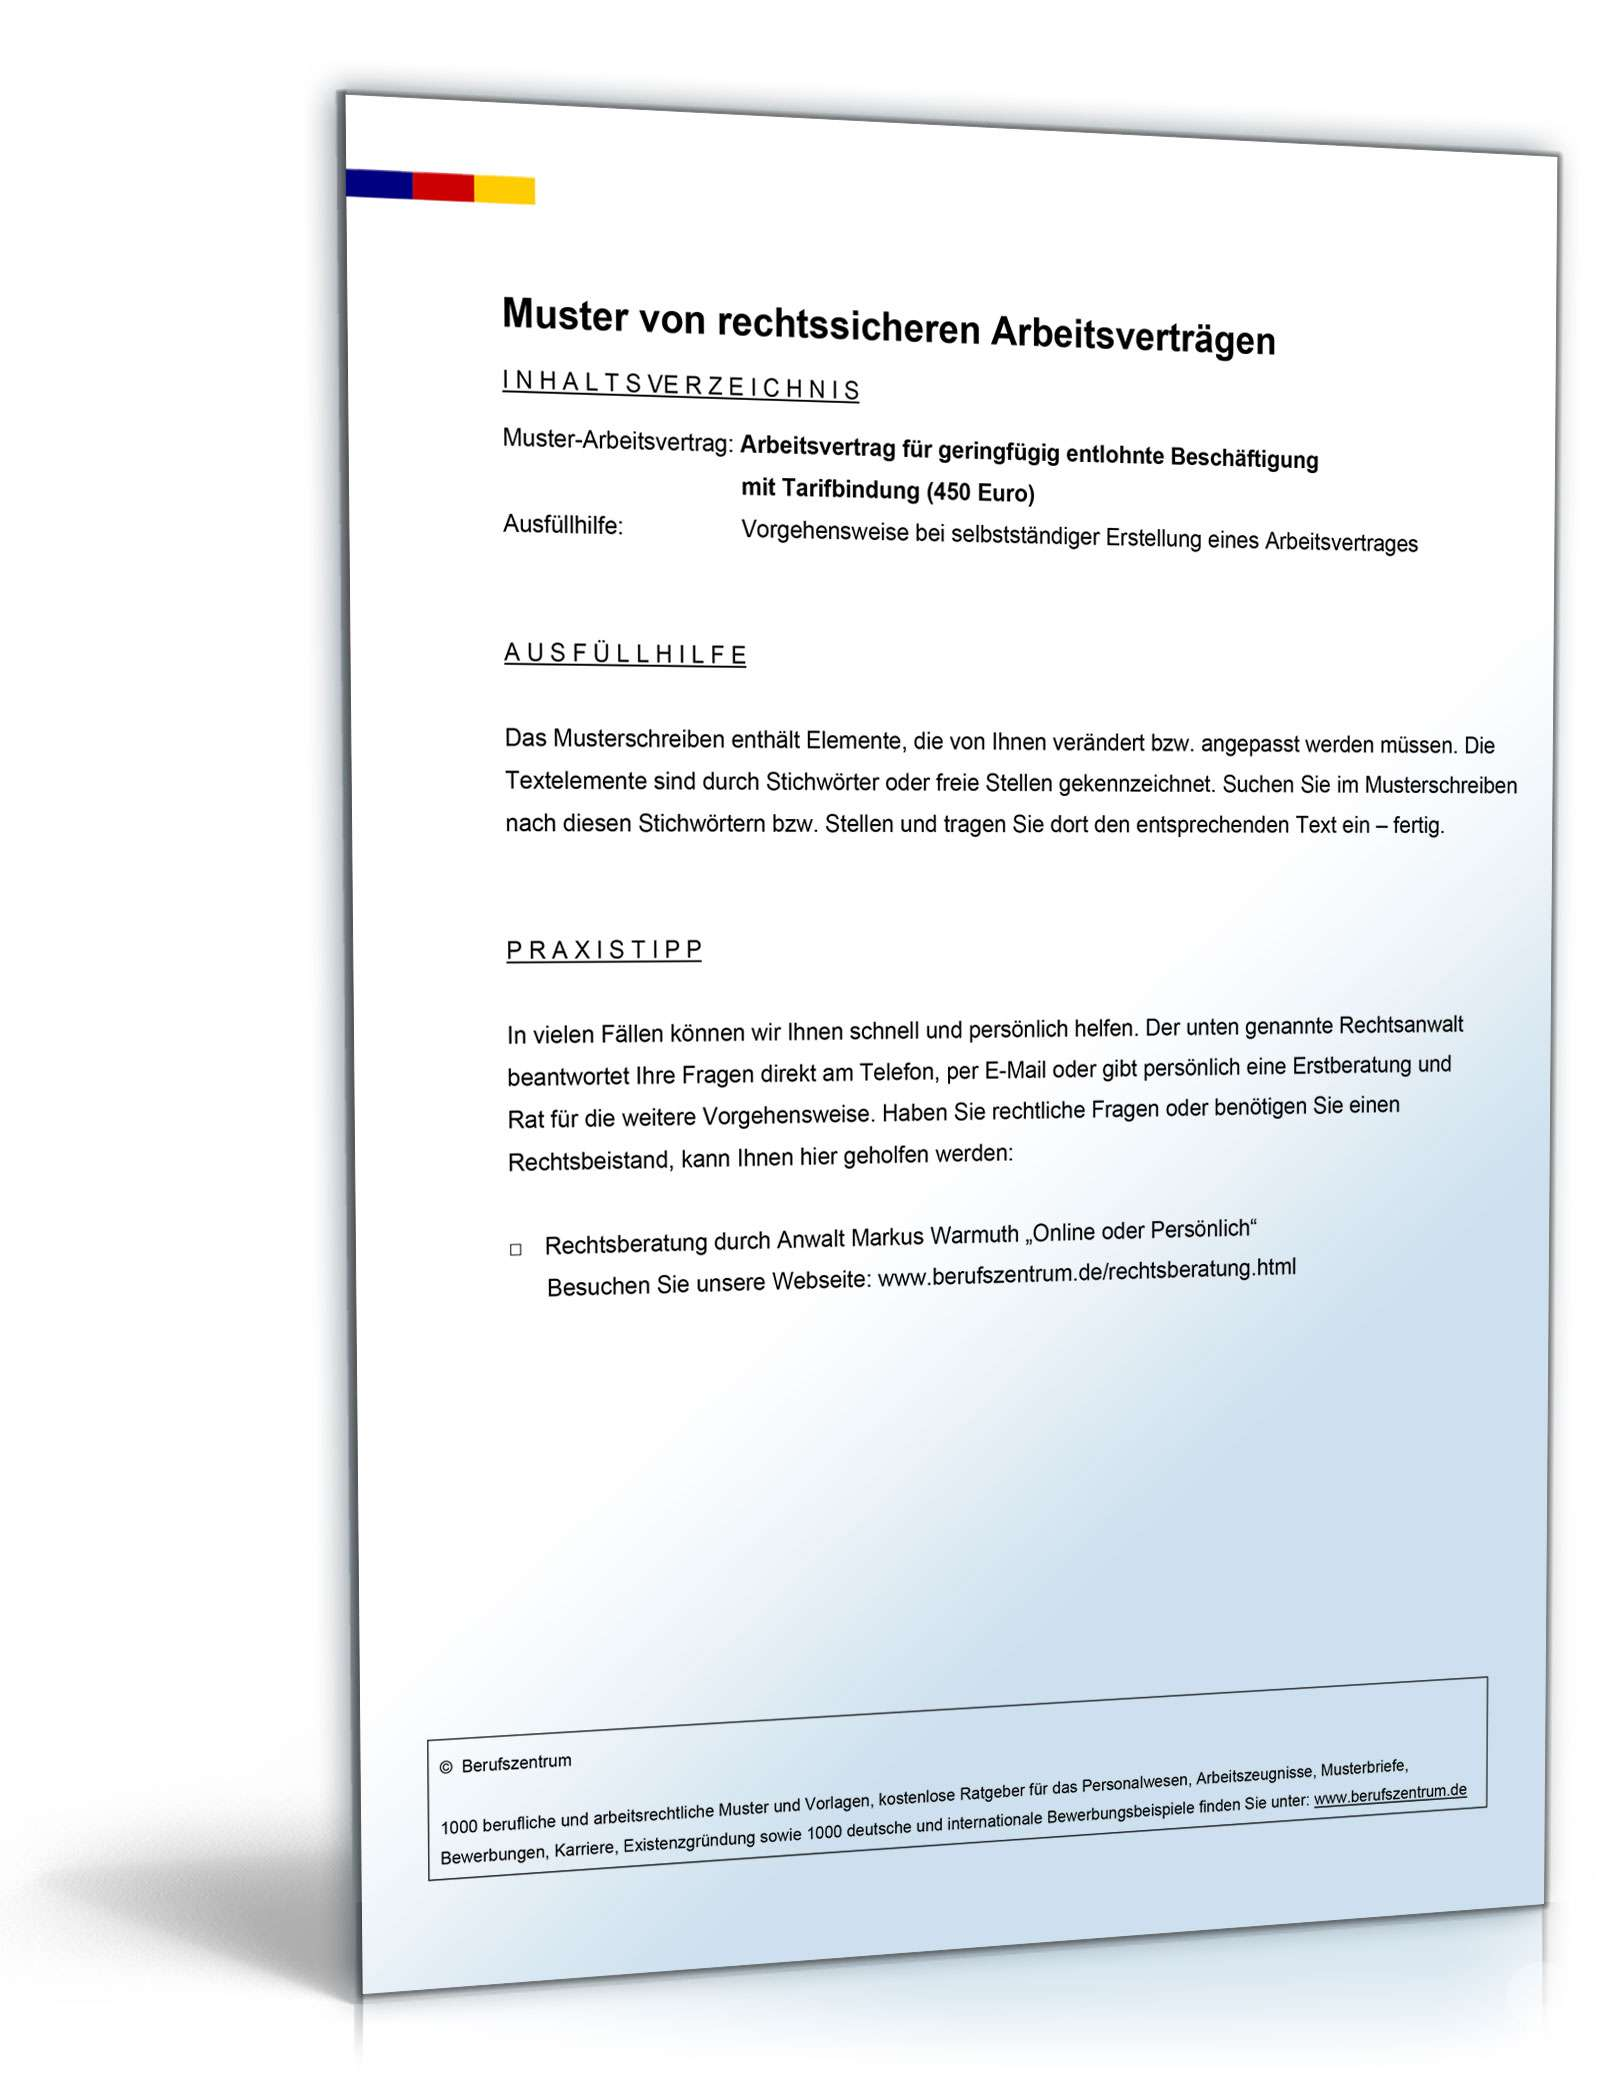 Arbeitsvertrag Minijob Mit Traifbindung Muster Zum Download